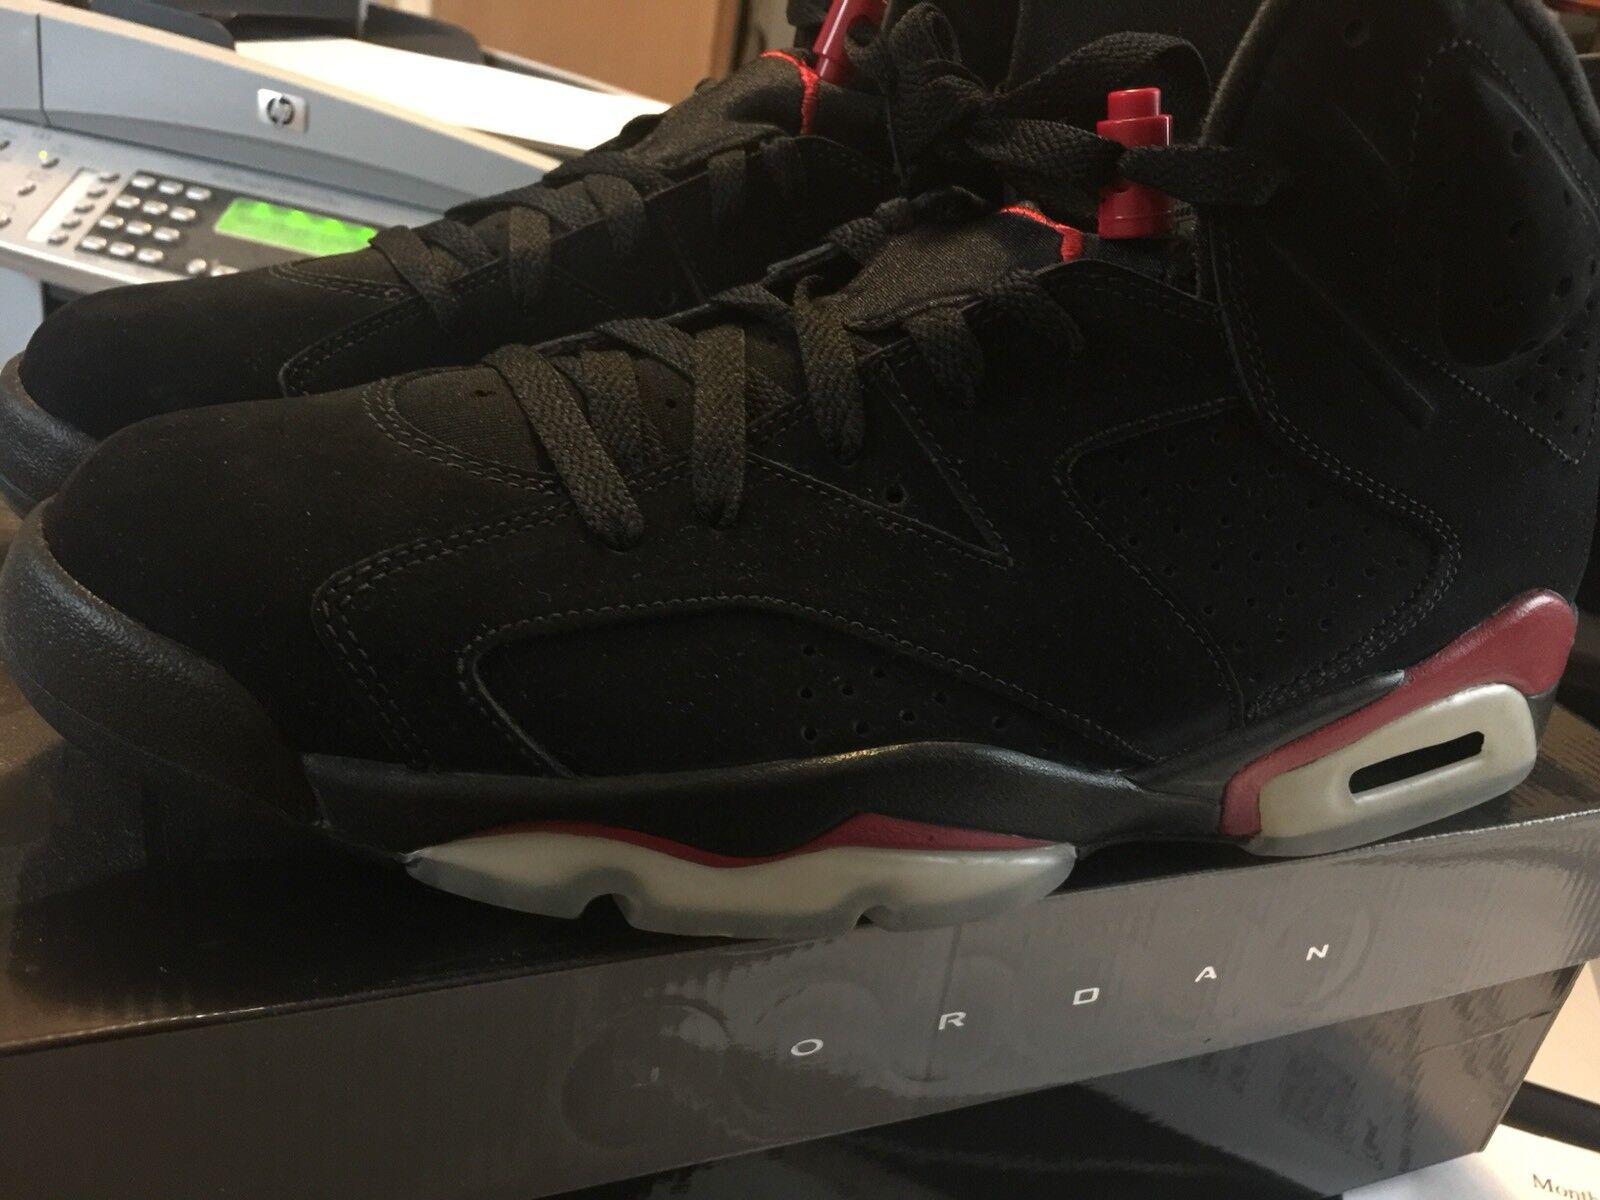 2010 Nike Air Jordan VI 6 Retro Black Infrared Size 11  Pack  BRED